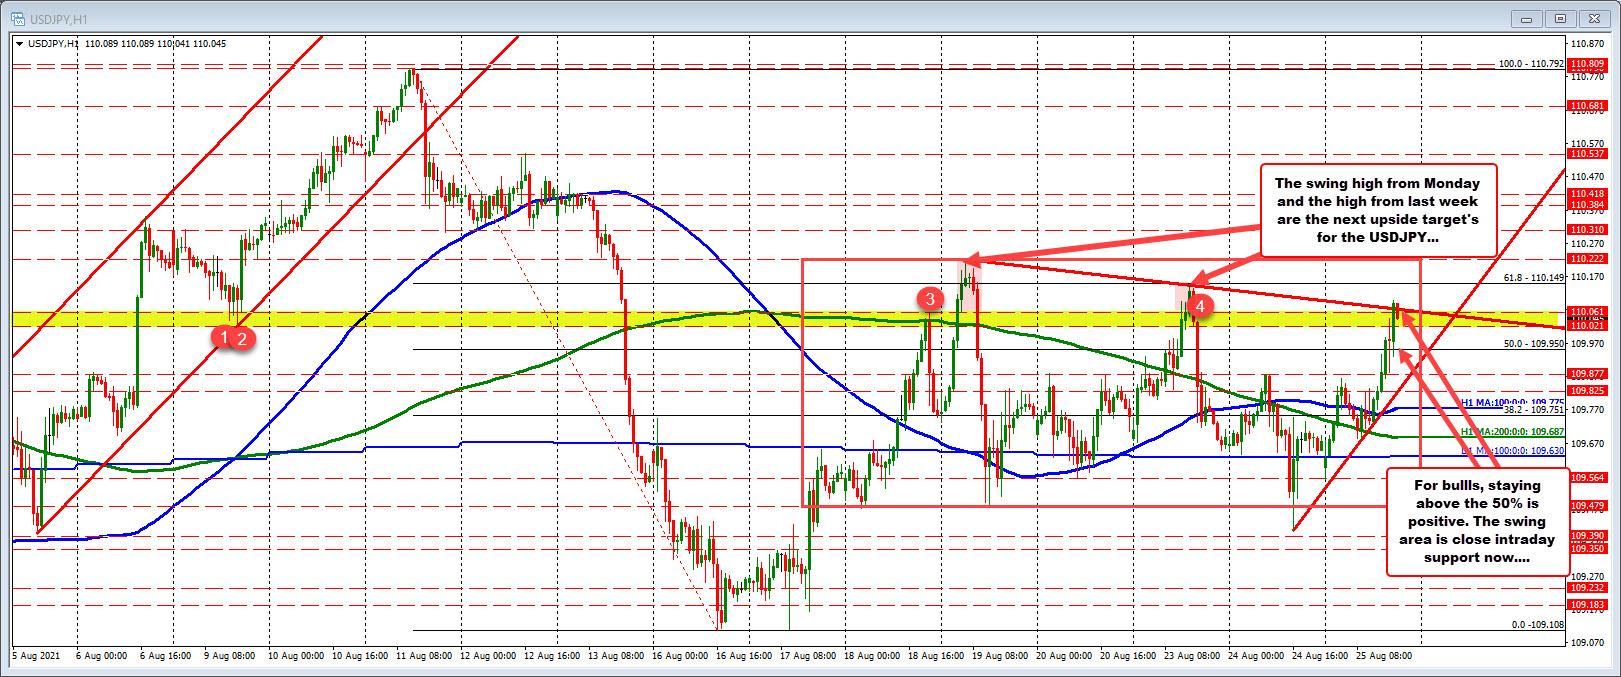 EURUSD on the hourly chart